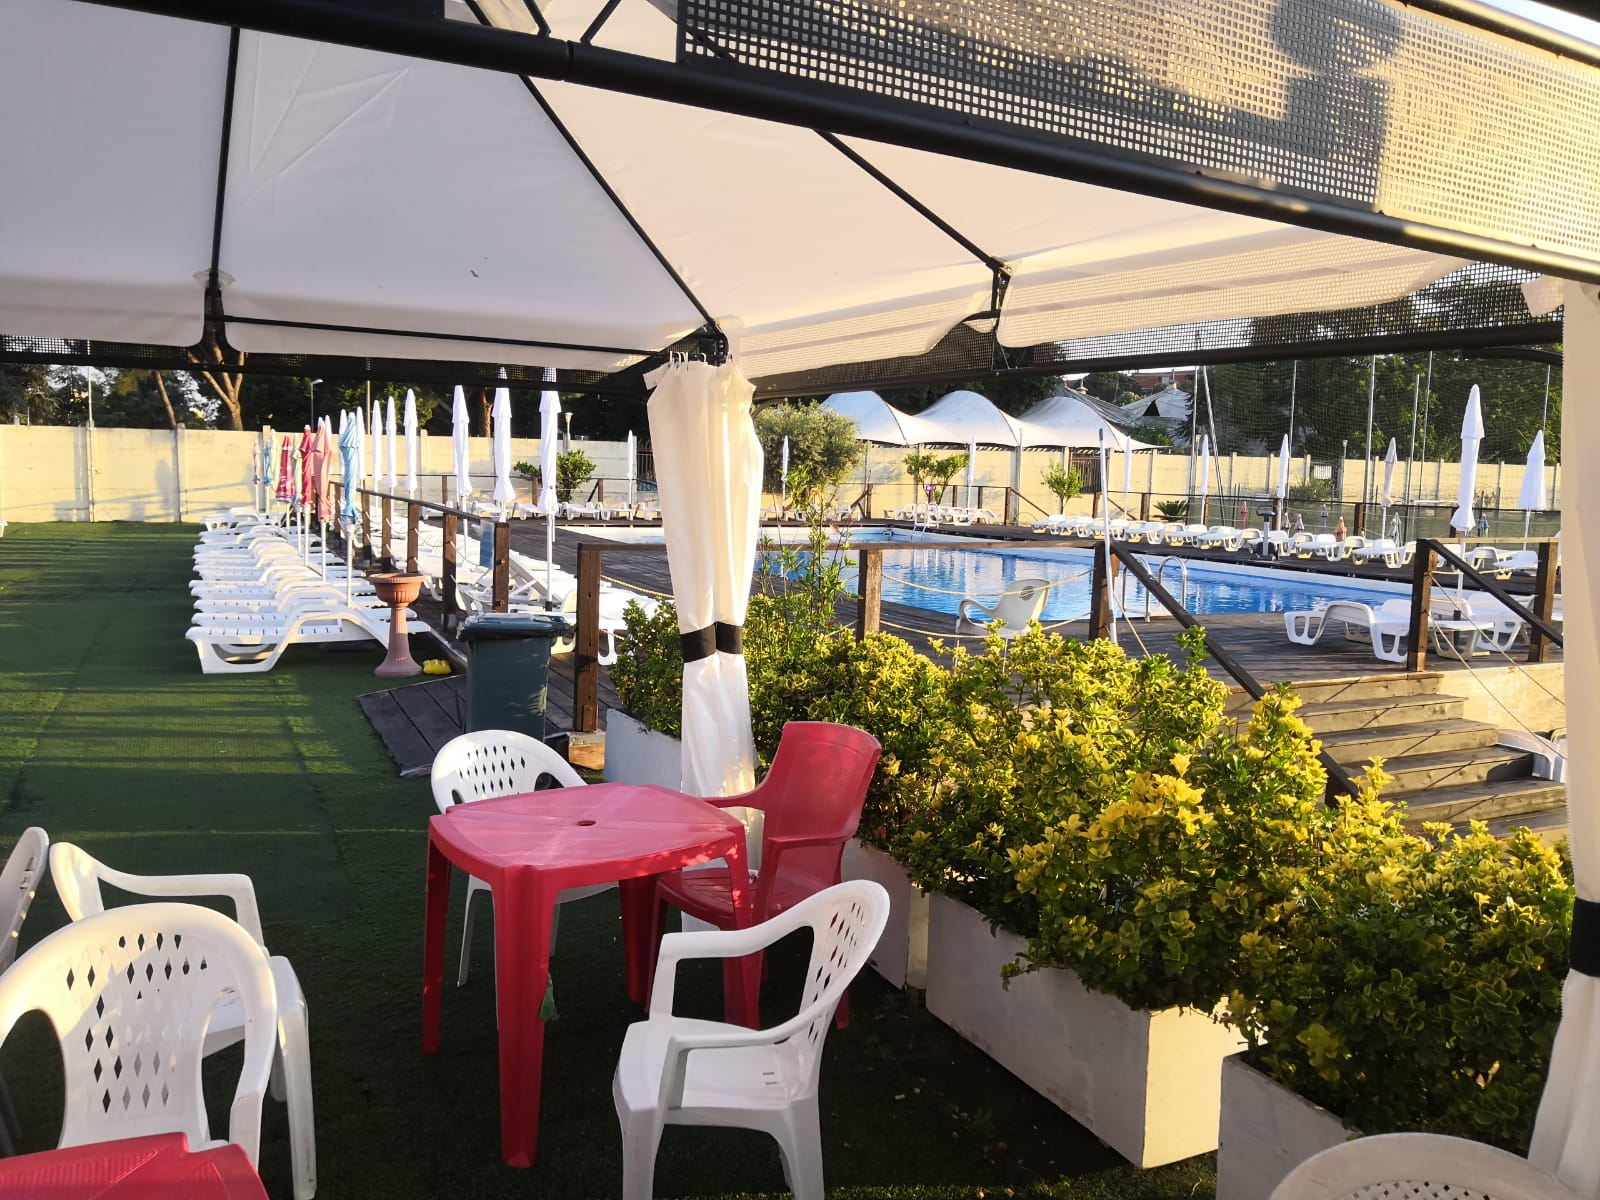 centocellefc piscina 2019 - 04